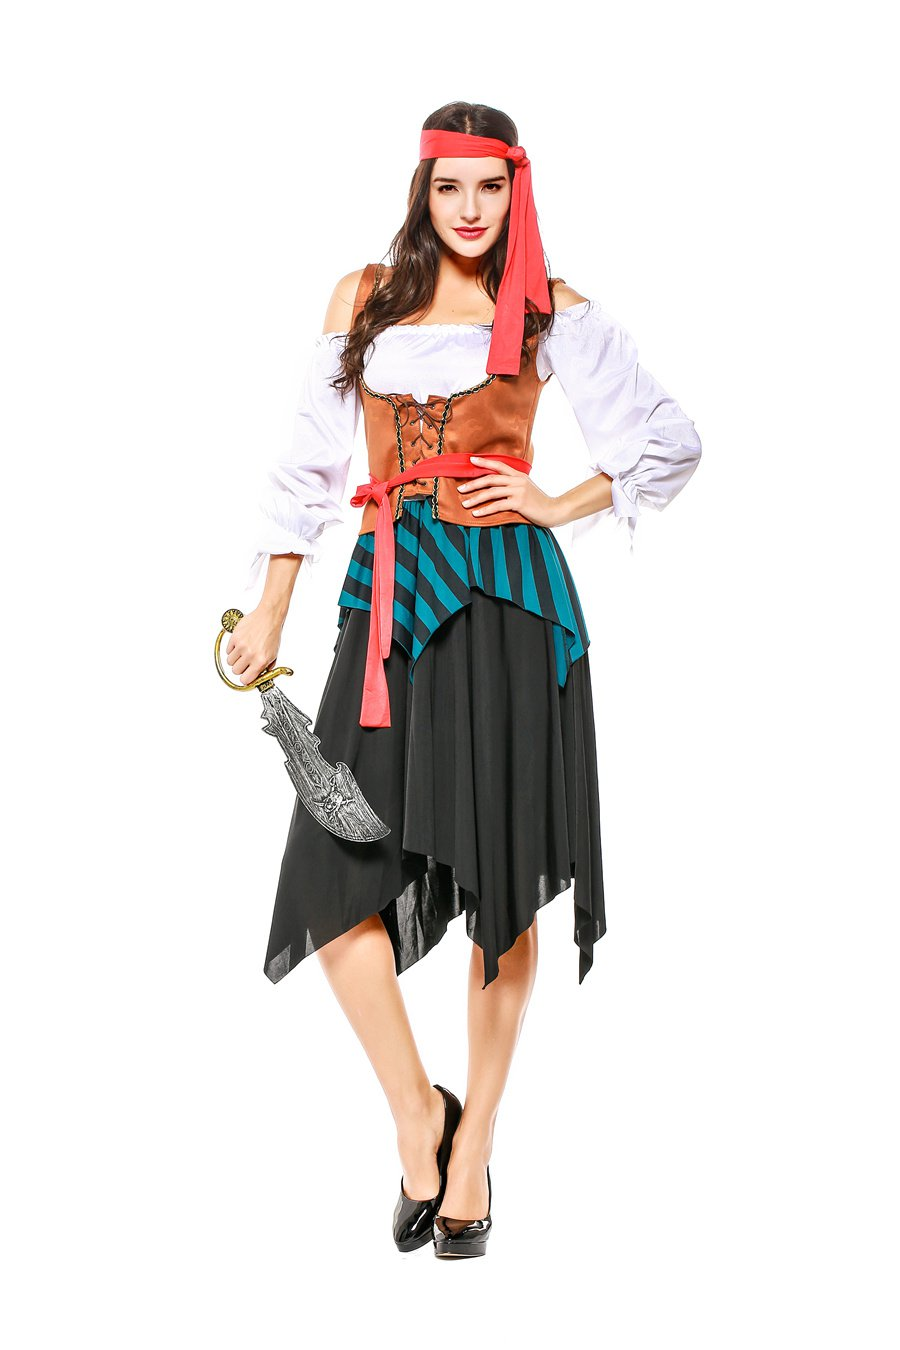 Halloween Crew Stage Drama Costume Carnival Sailor COS Uniform Pirate Cosplay Costume